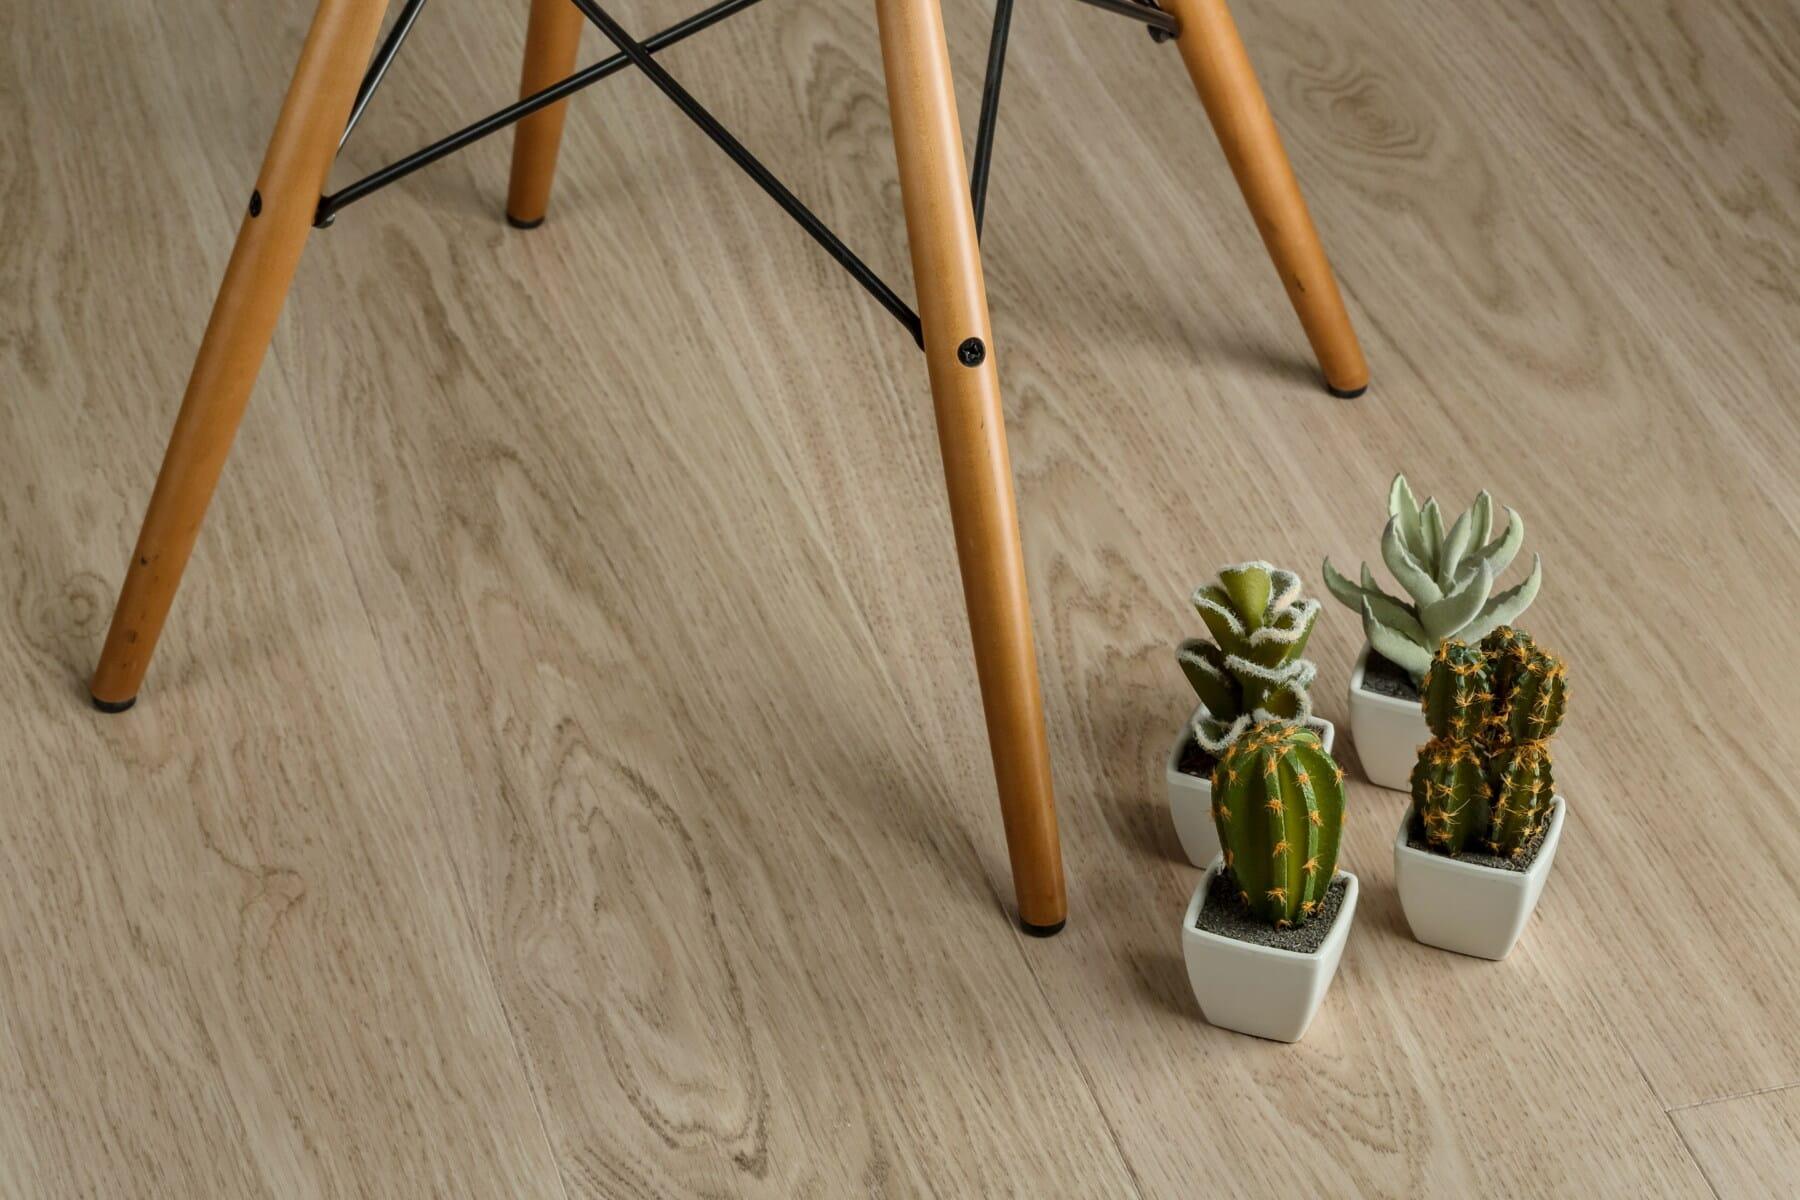 miniature, chair, cactus, floor, flowerpot, parquet, hardwood, stool, comfortable, wooden